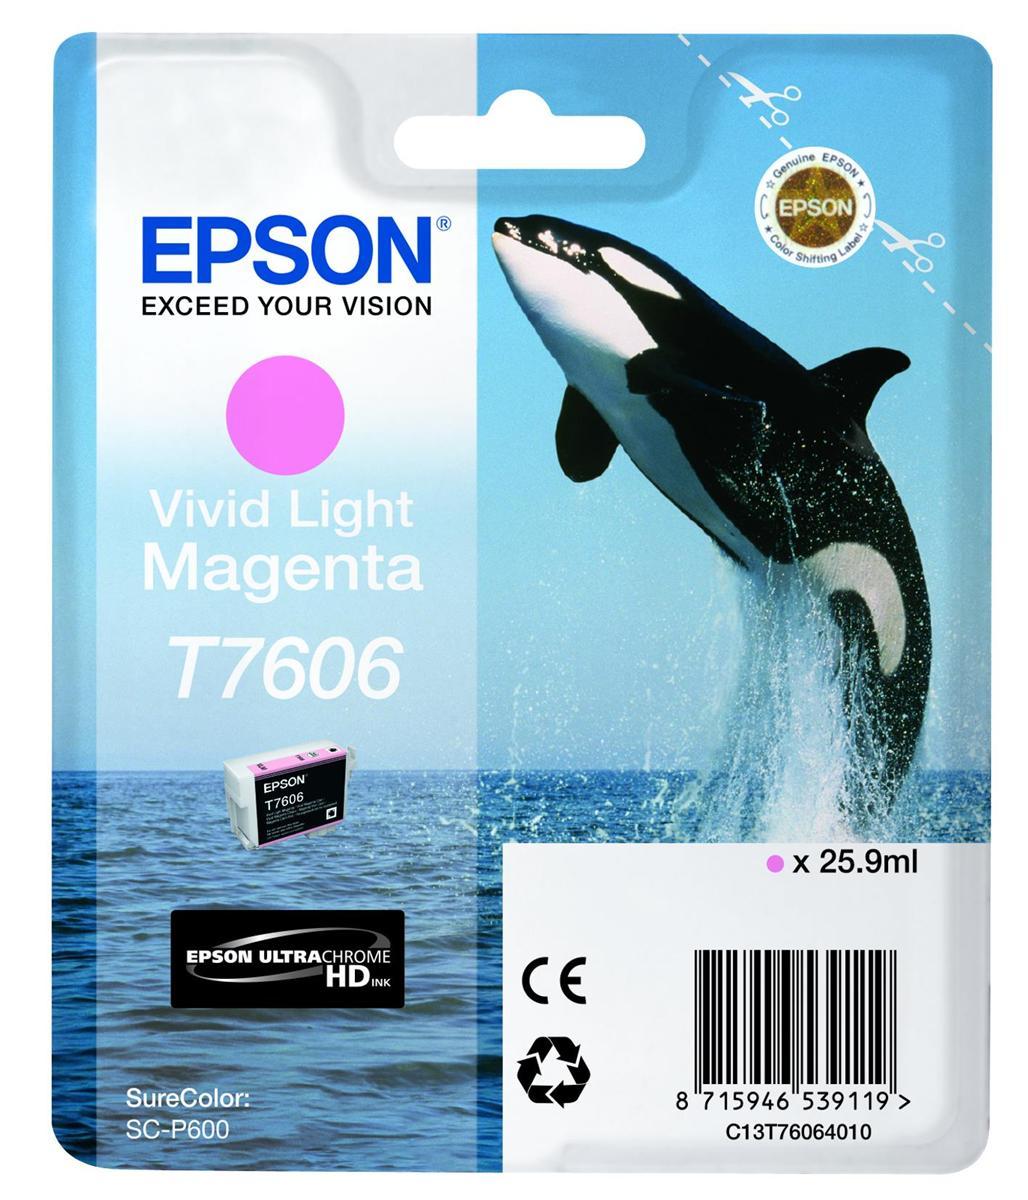 Epson T7606 Ink Cartridge Dolphin 25.9ml Light Magenta Ref C13T76064010